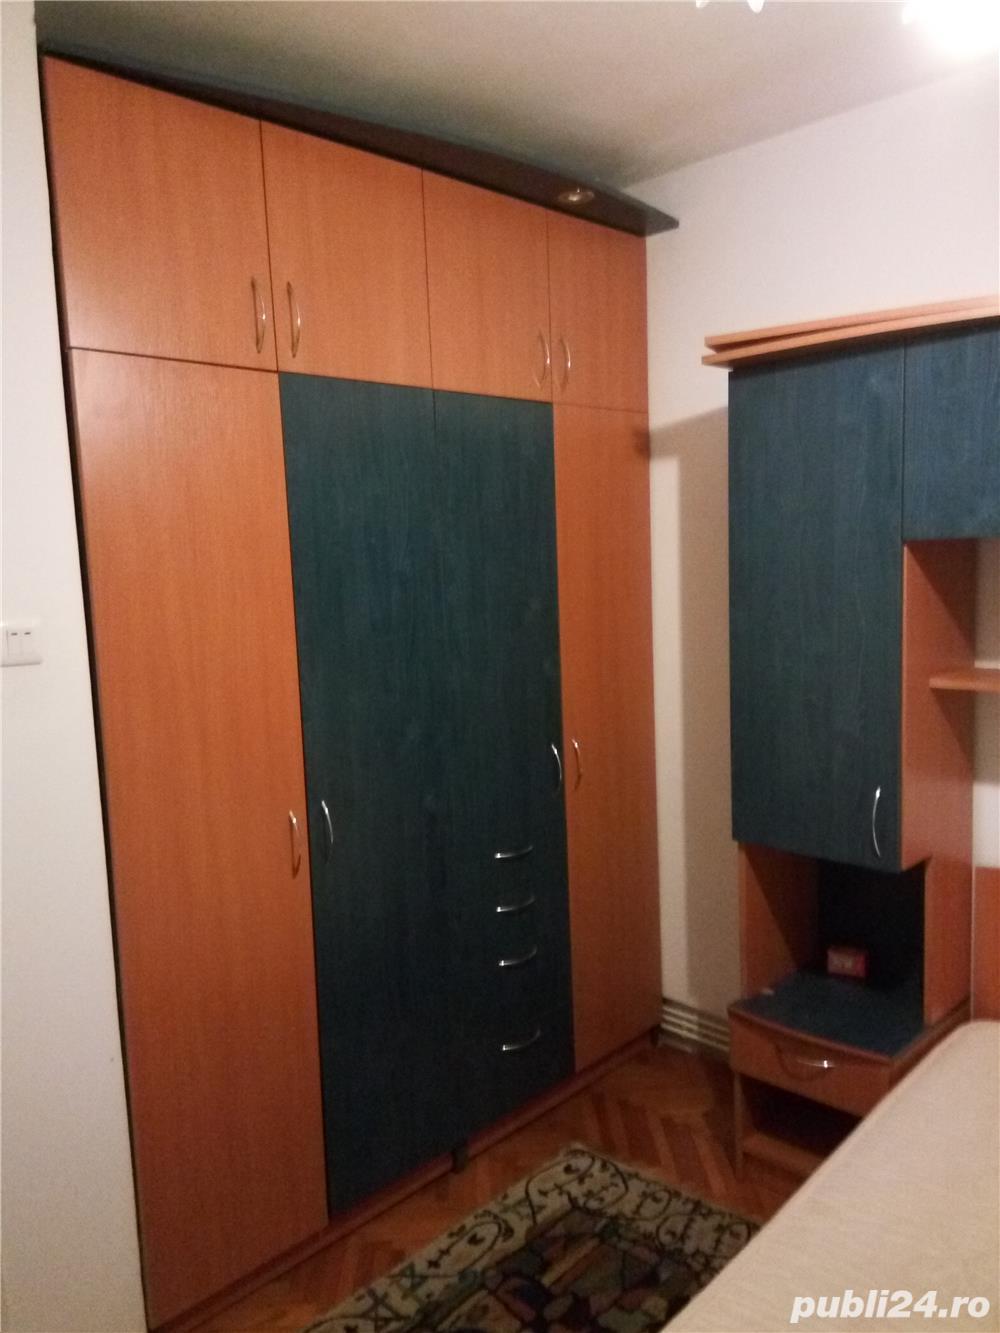 Inchiriez apartament 3 camere, cart Grigorescu